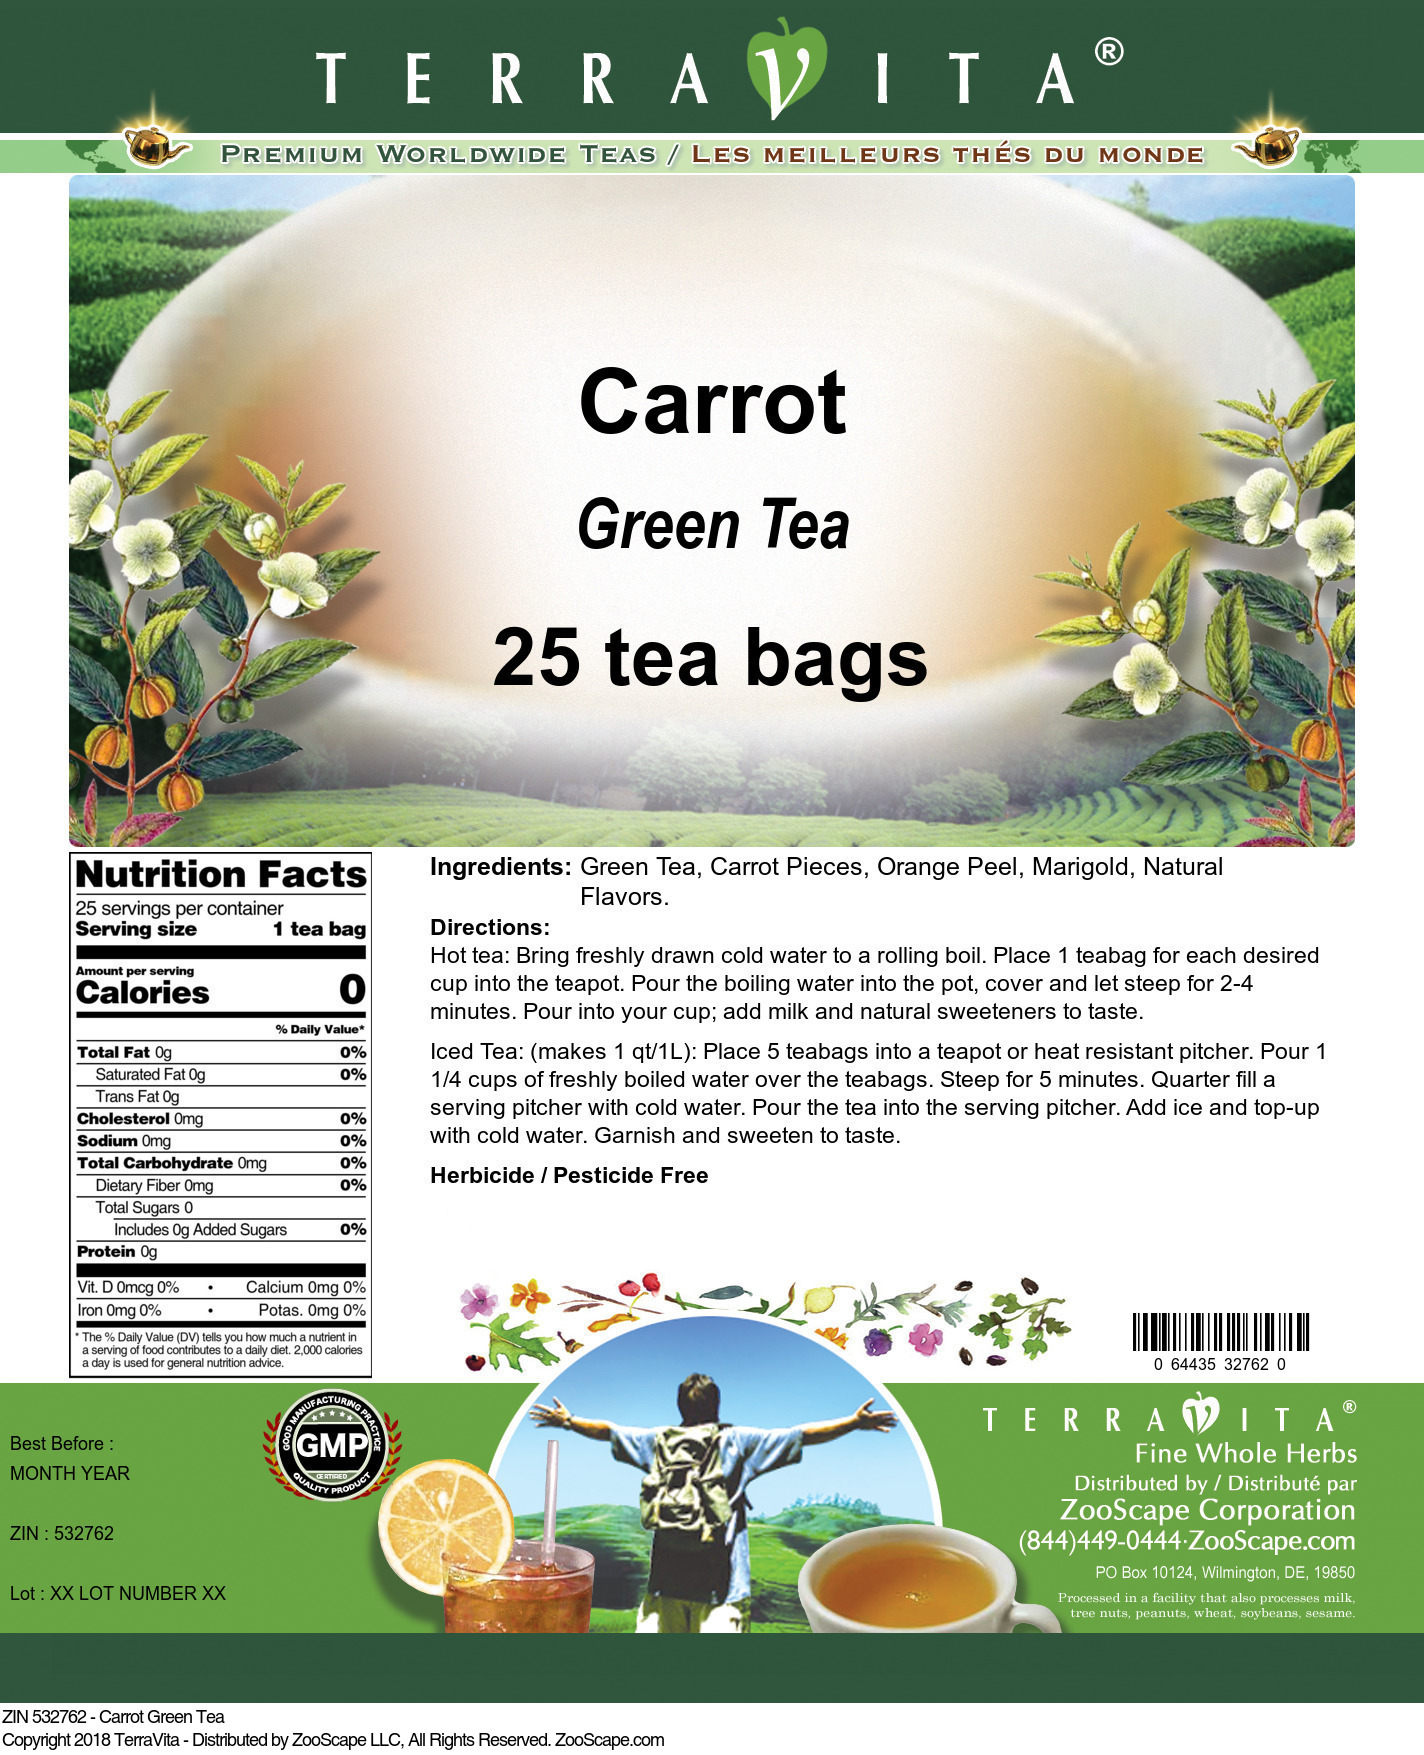 Carrot Green Tea